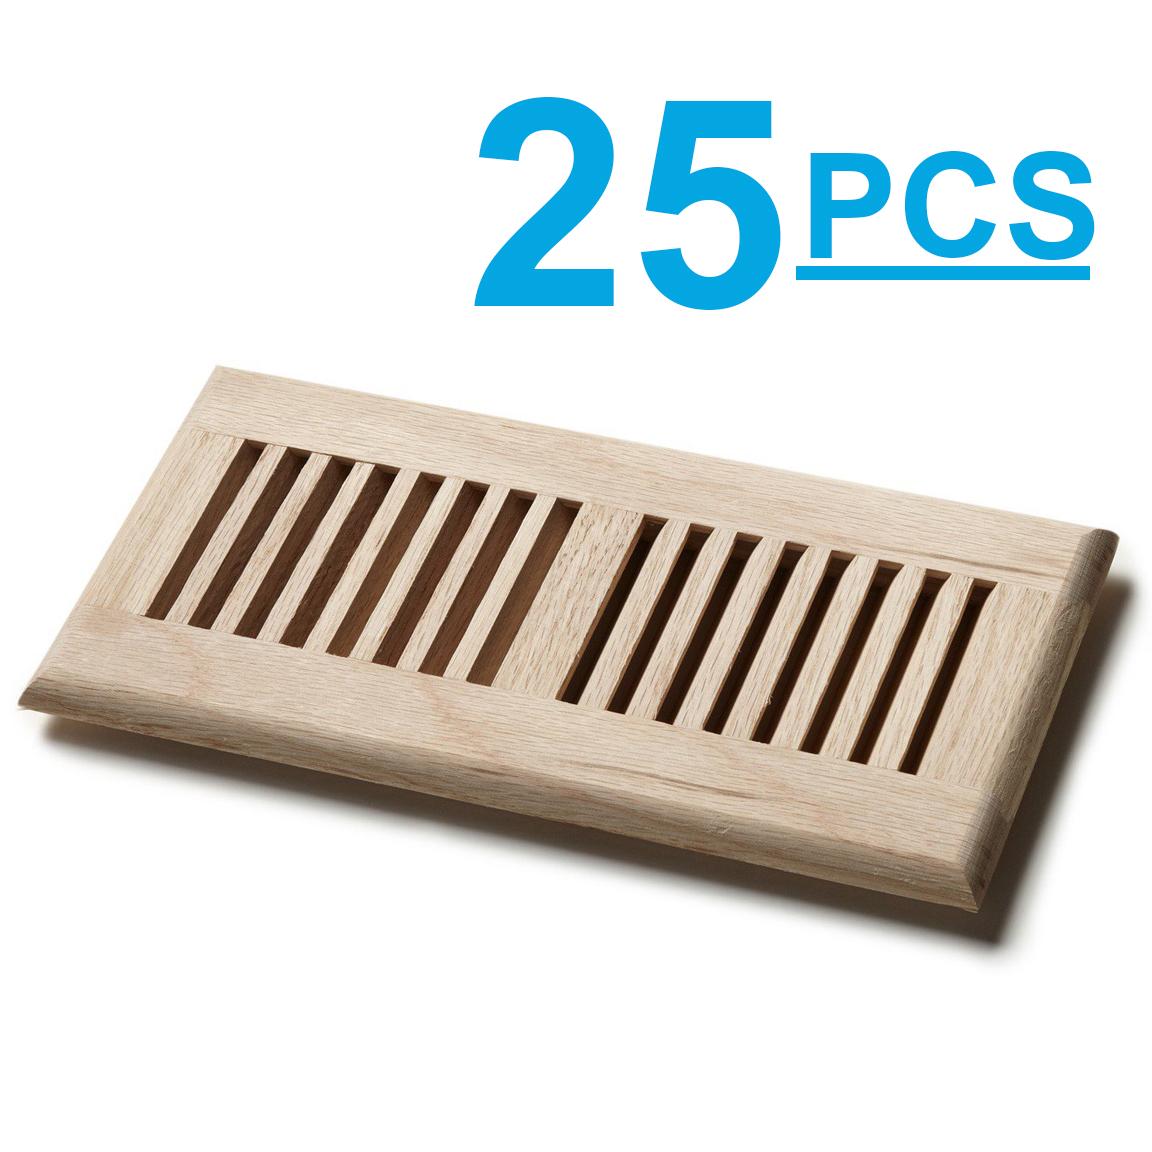 "Venice LOT 25pcs 4""x12"" White Oak Wood Vent Floor Self Rimming Unfinished Damper"